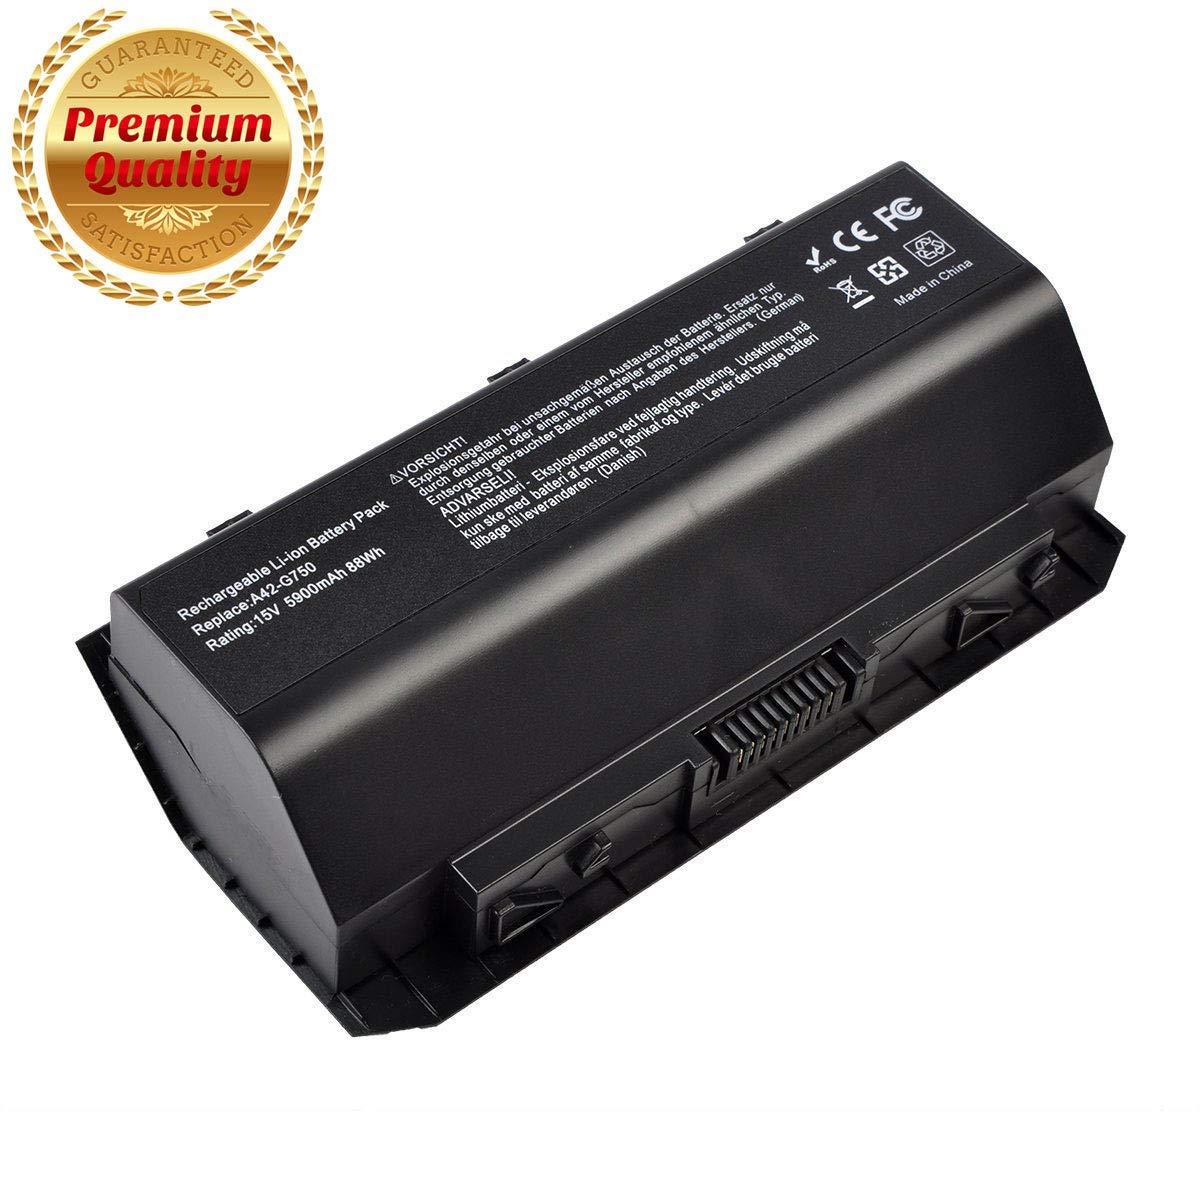 Bateria A42-g750 Asus Rog A42-g750 G750j G750jw G750jx G750j